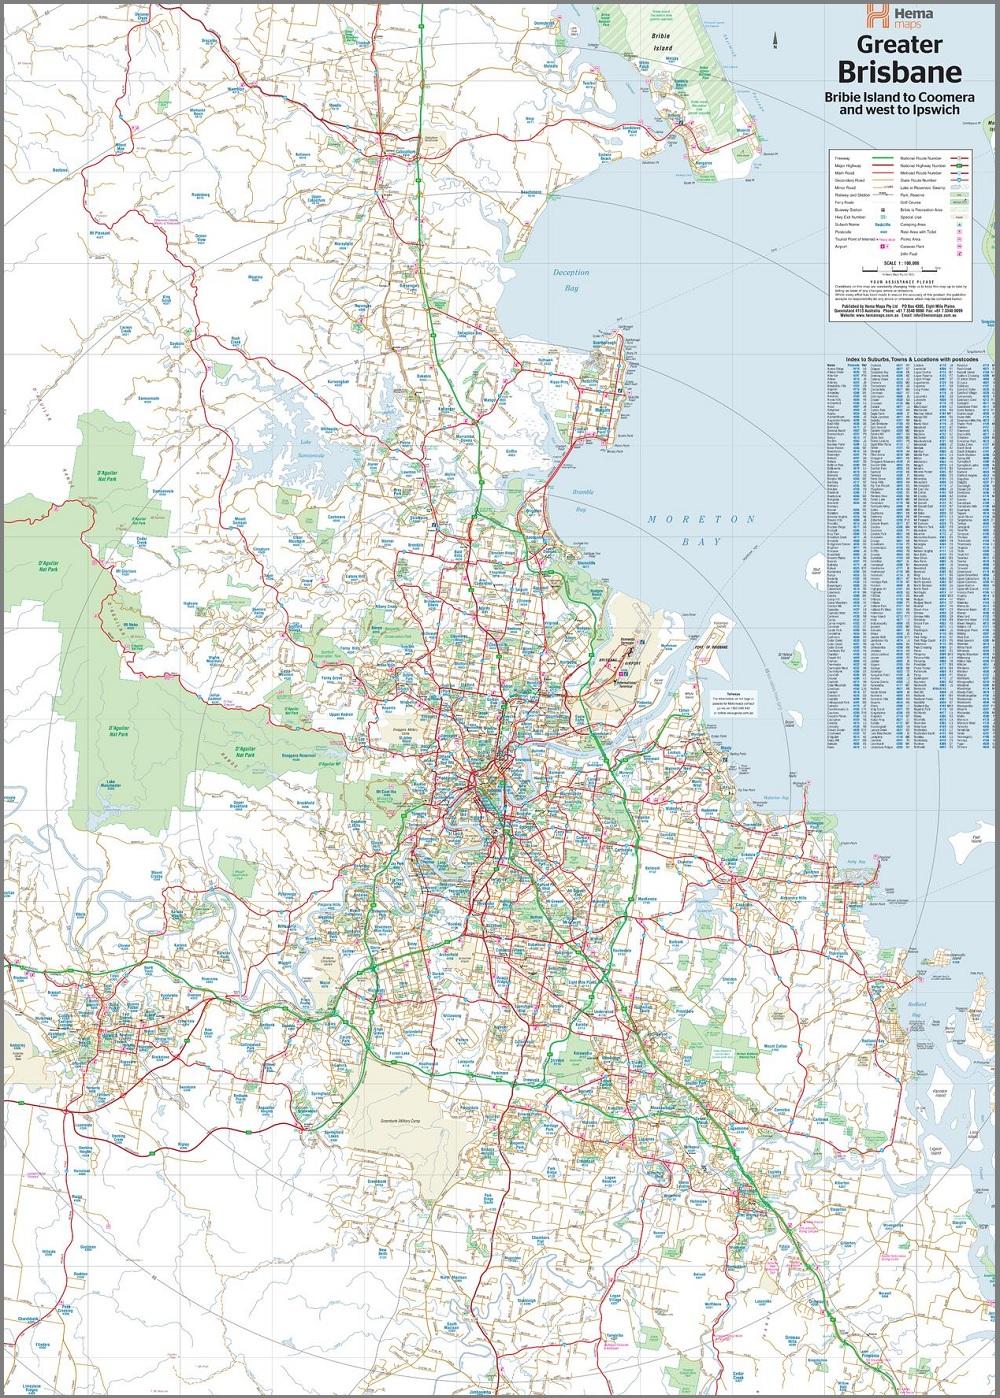 Peta Brisbane